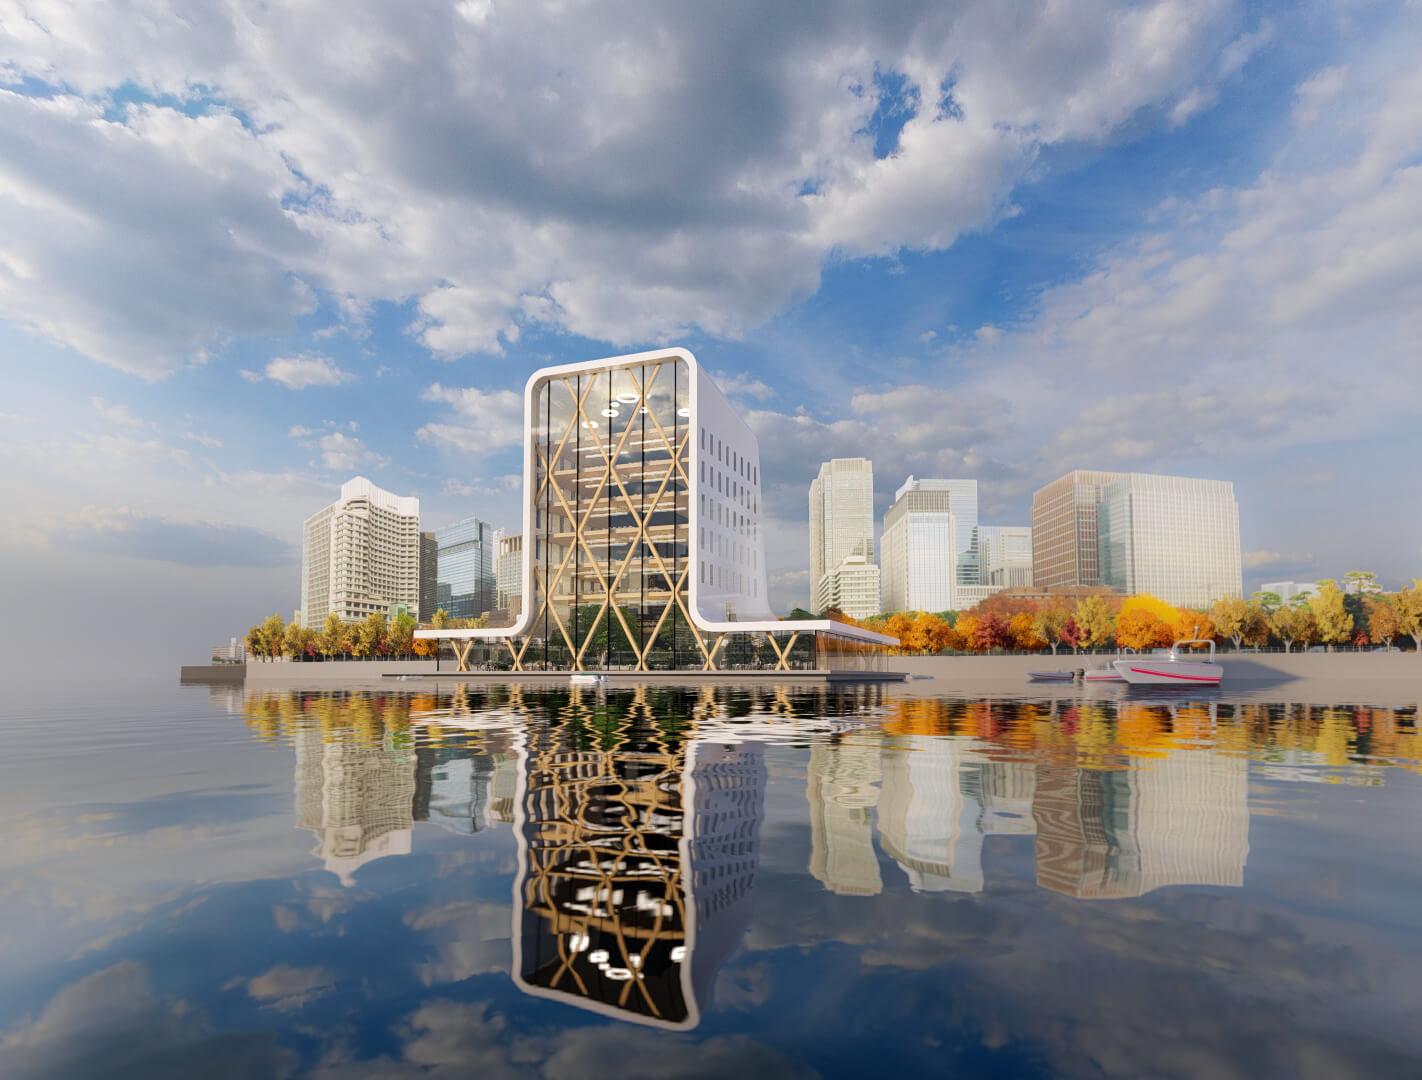 Waterstudio.nl - Floating office